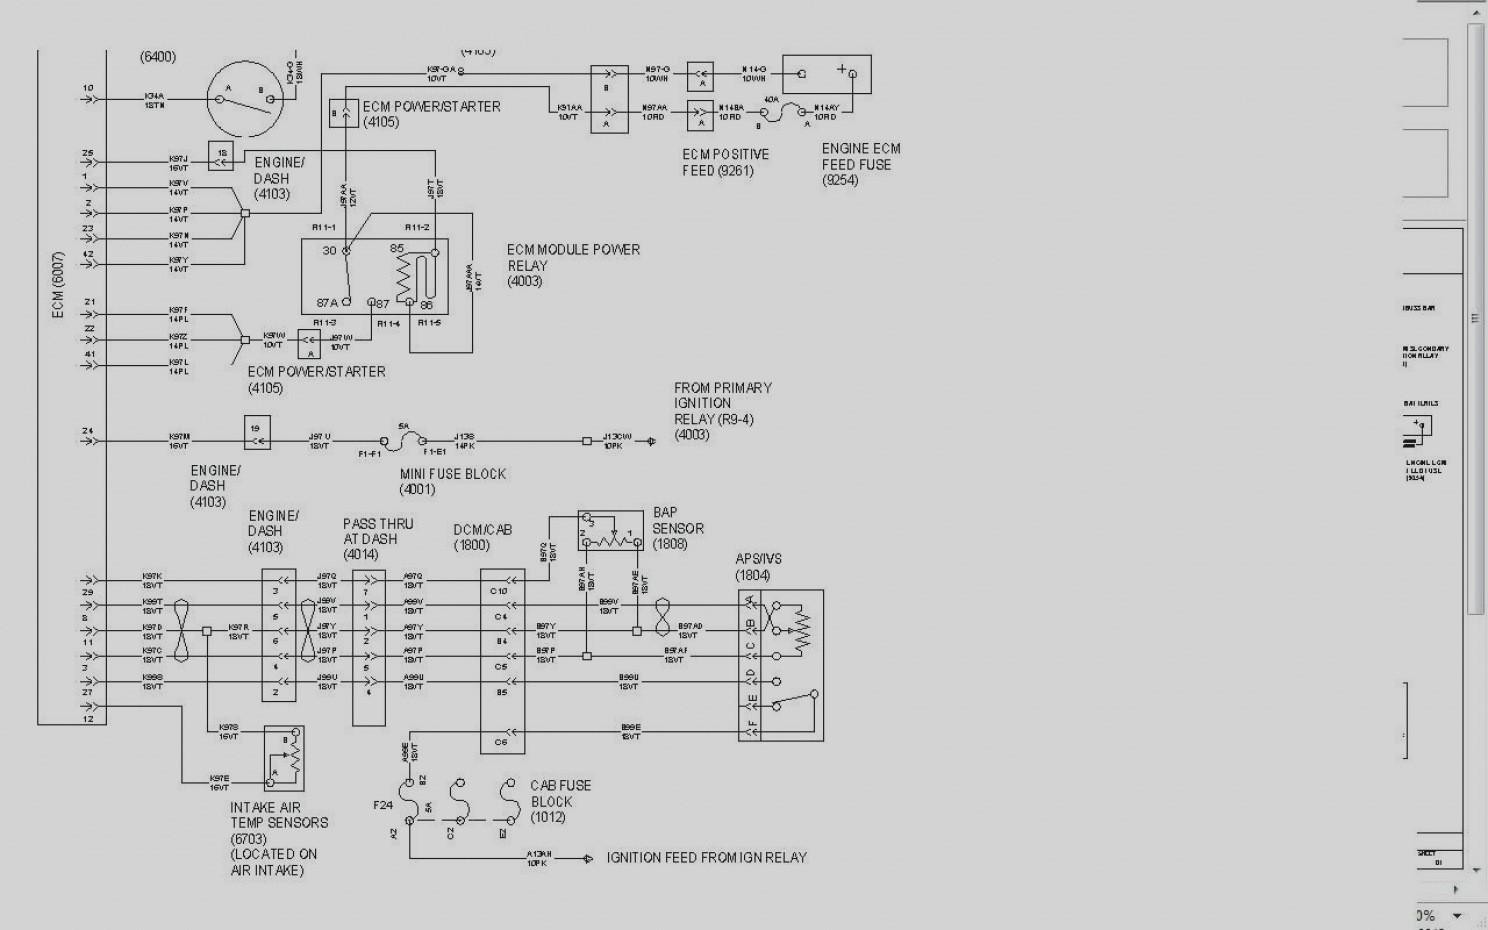 1981 international dt466 wiring diagram wiring diagram data international truck air brake diagram international truck wiring schematic #6